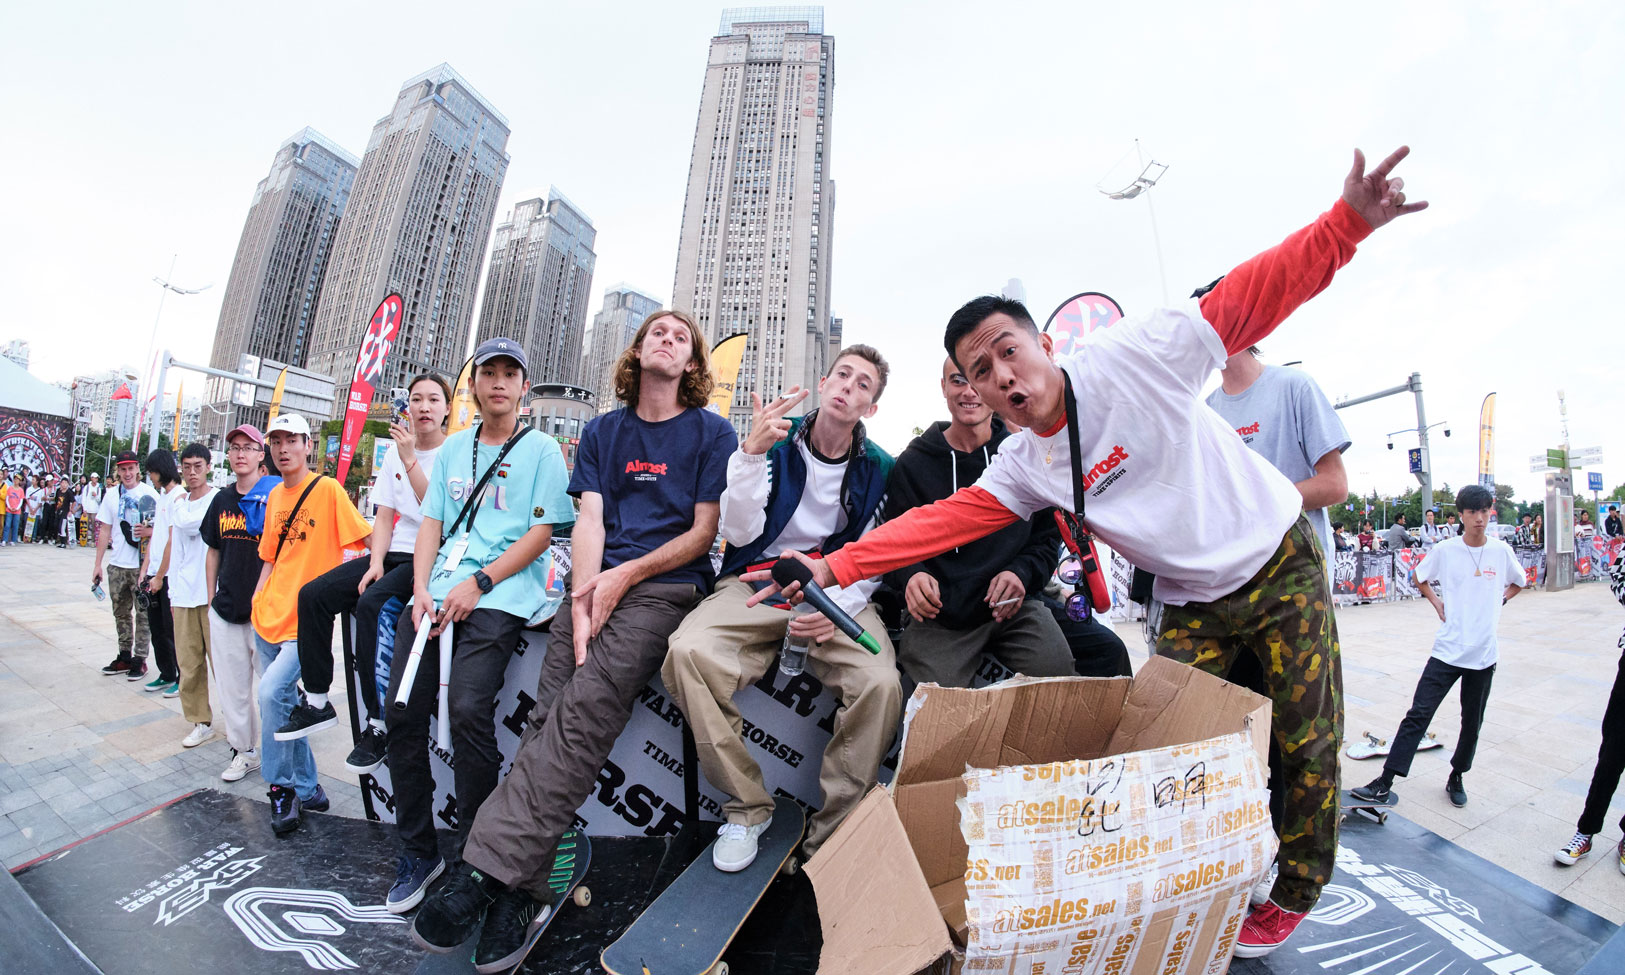 INXXSTREETLab 滑板之旅——潮流视角下的街头文化